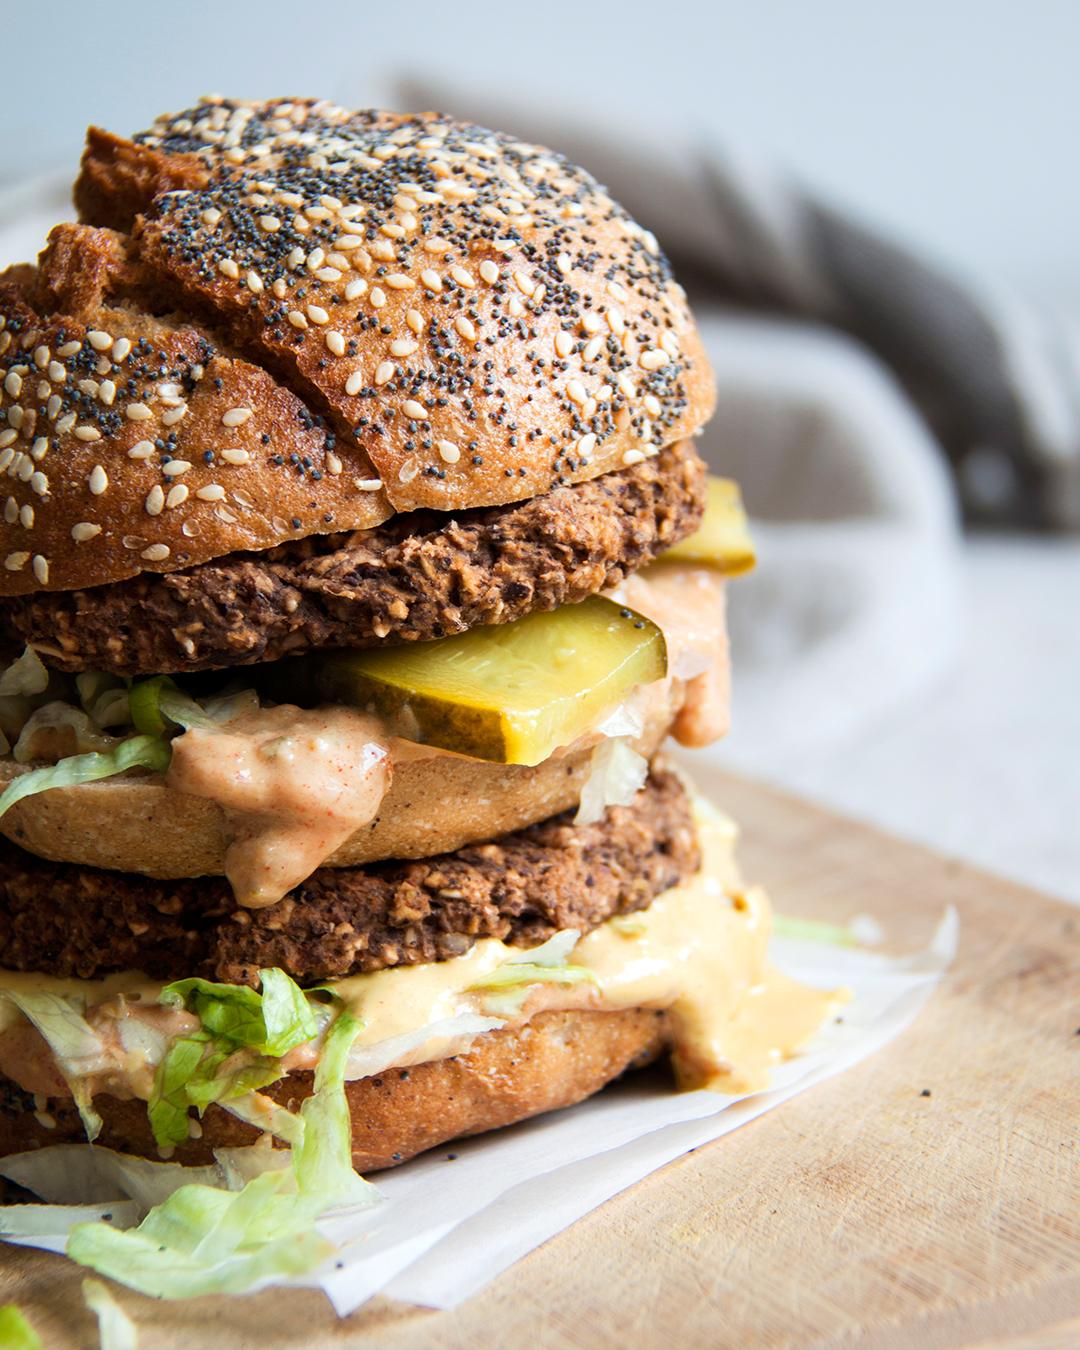 whole-food-plant-based-big-mac-vegan-whole-foods-olievrij-suikervrij-01b.jpg